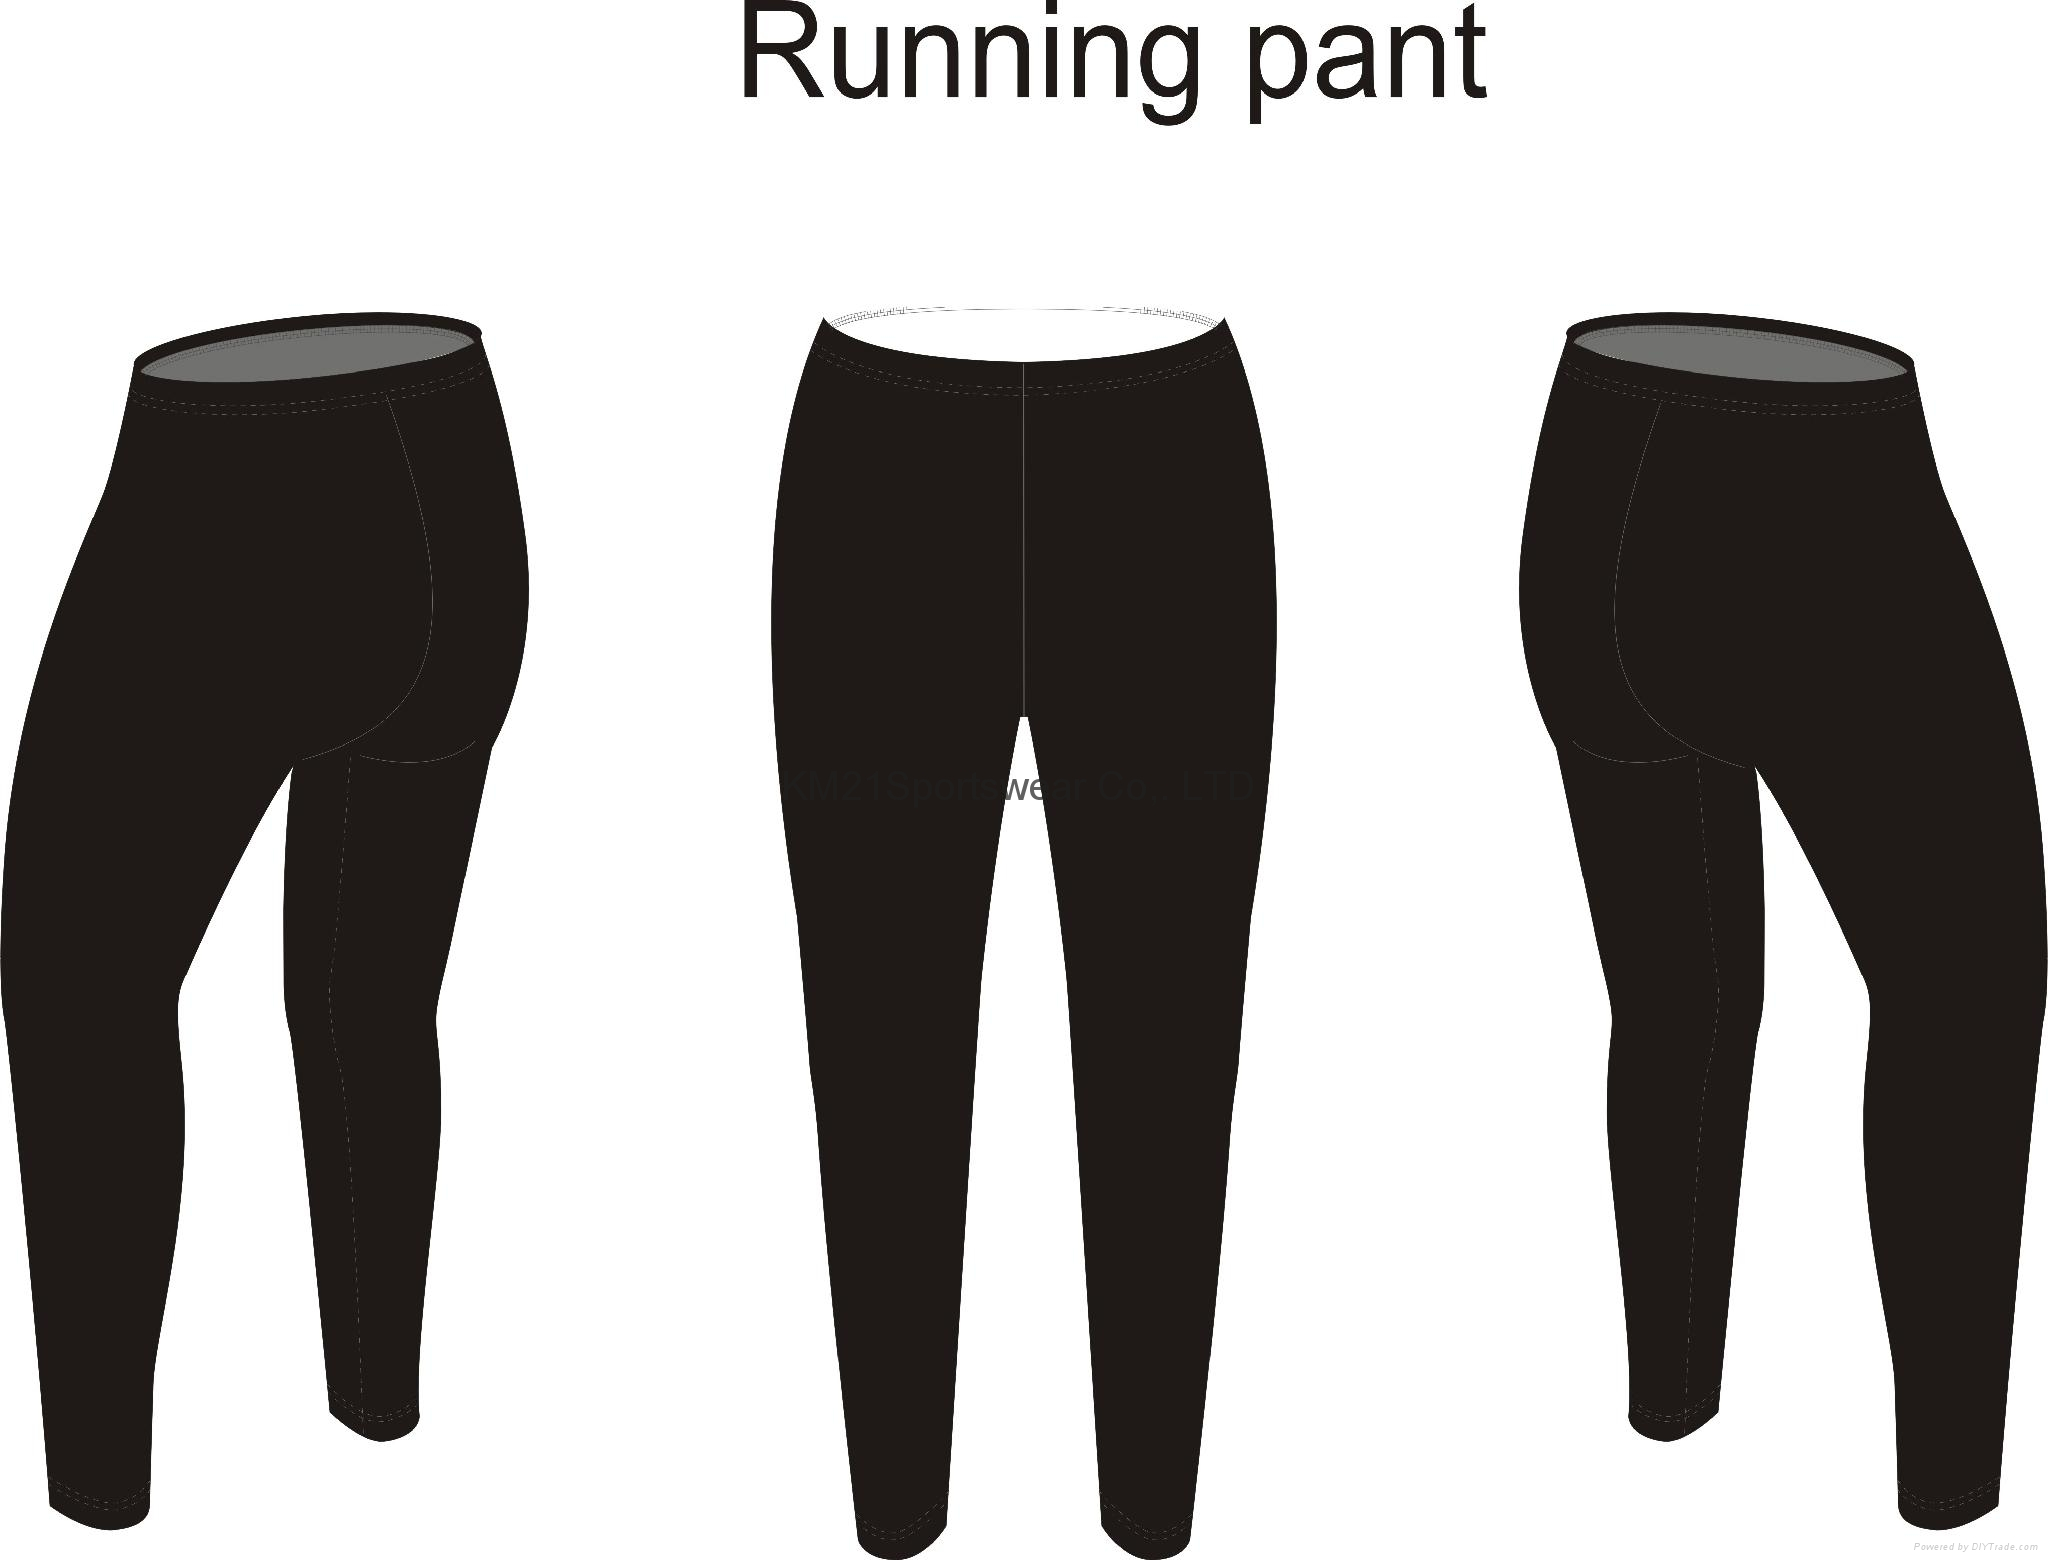 autocross jersey Hot Men Custom Training Running Wear With Sublimation 3